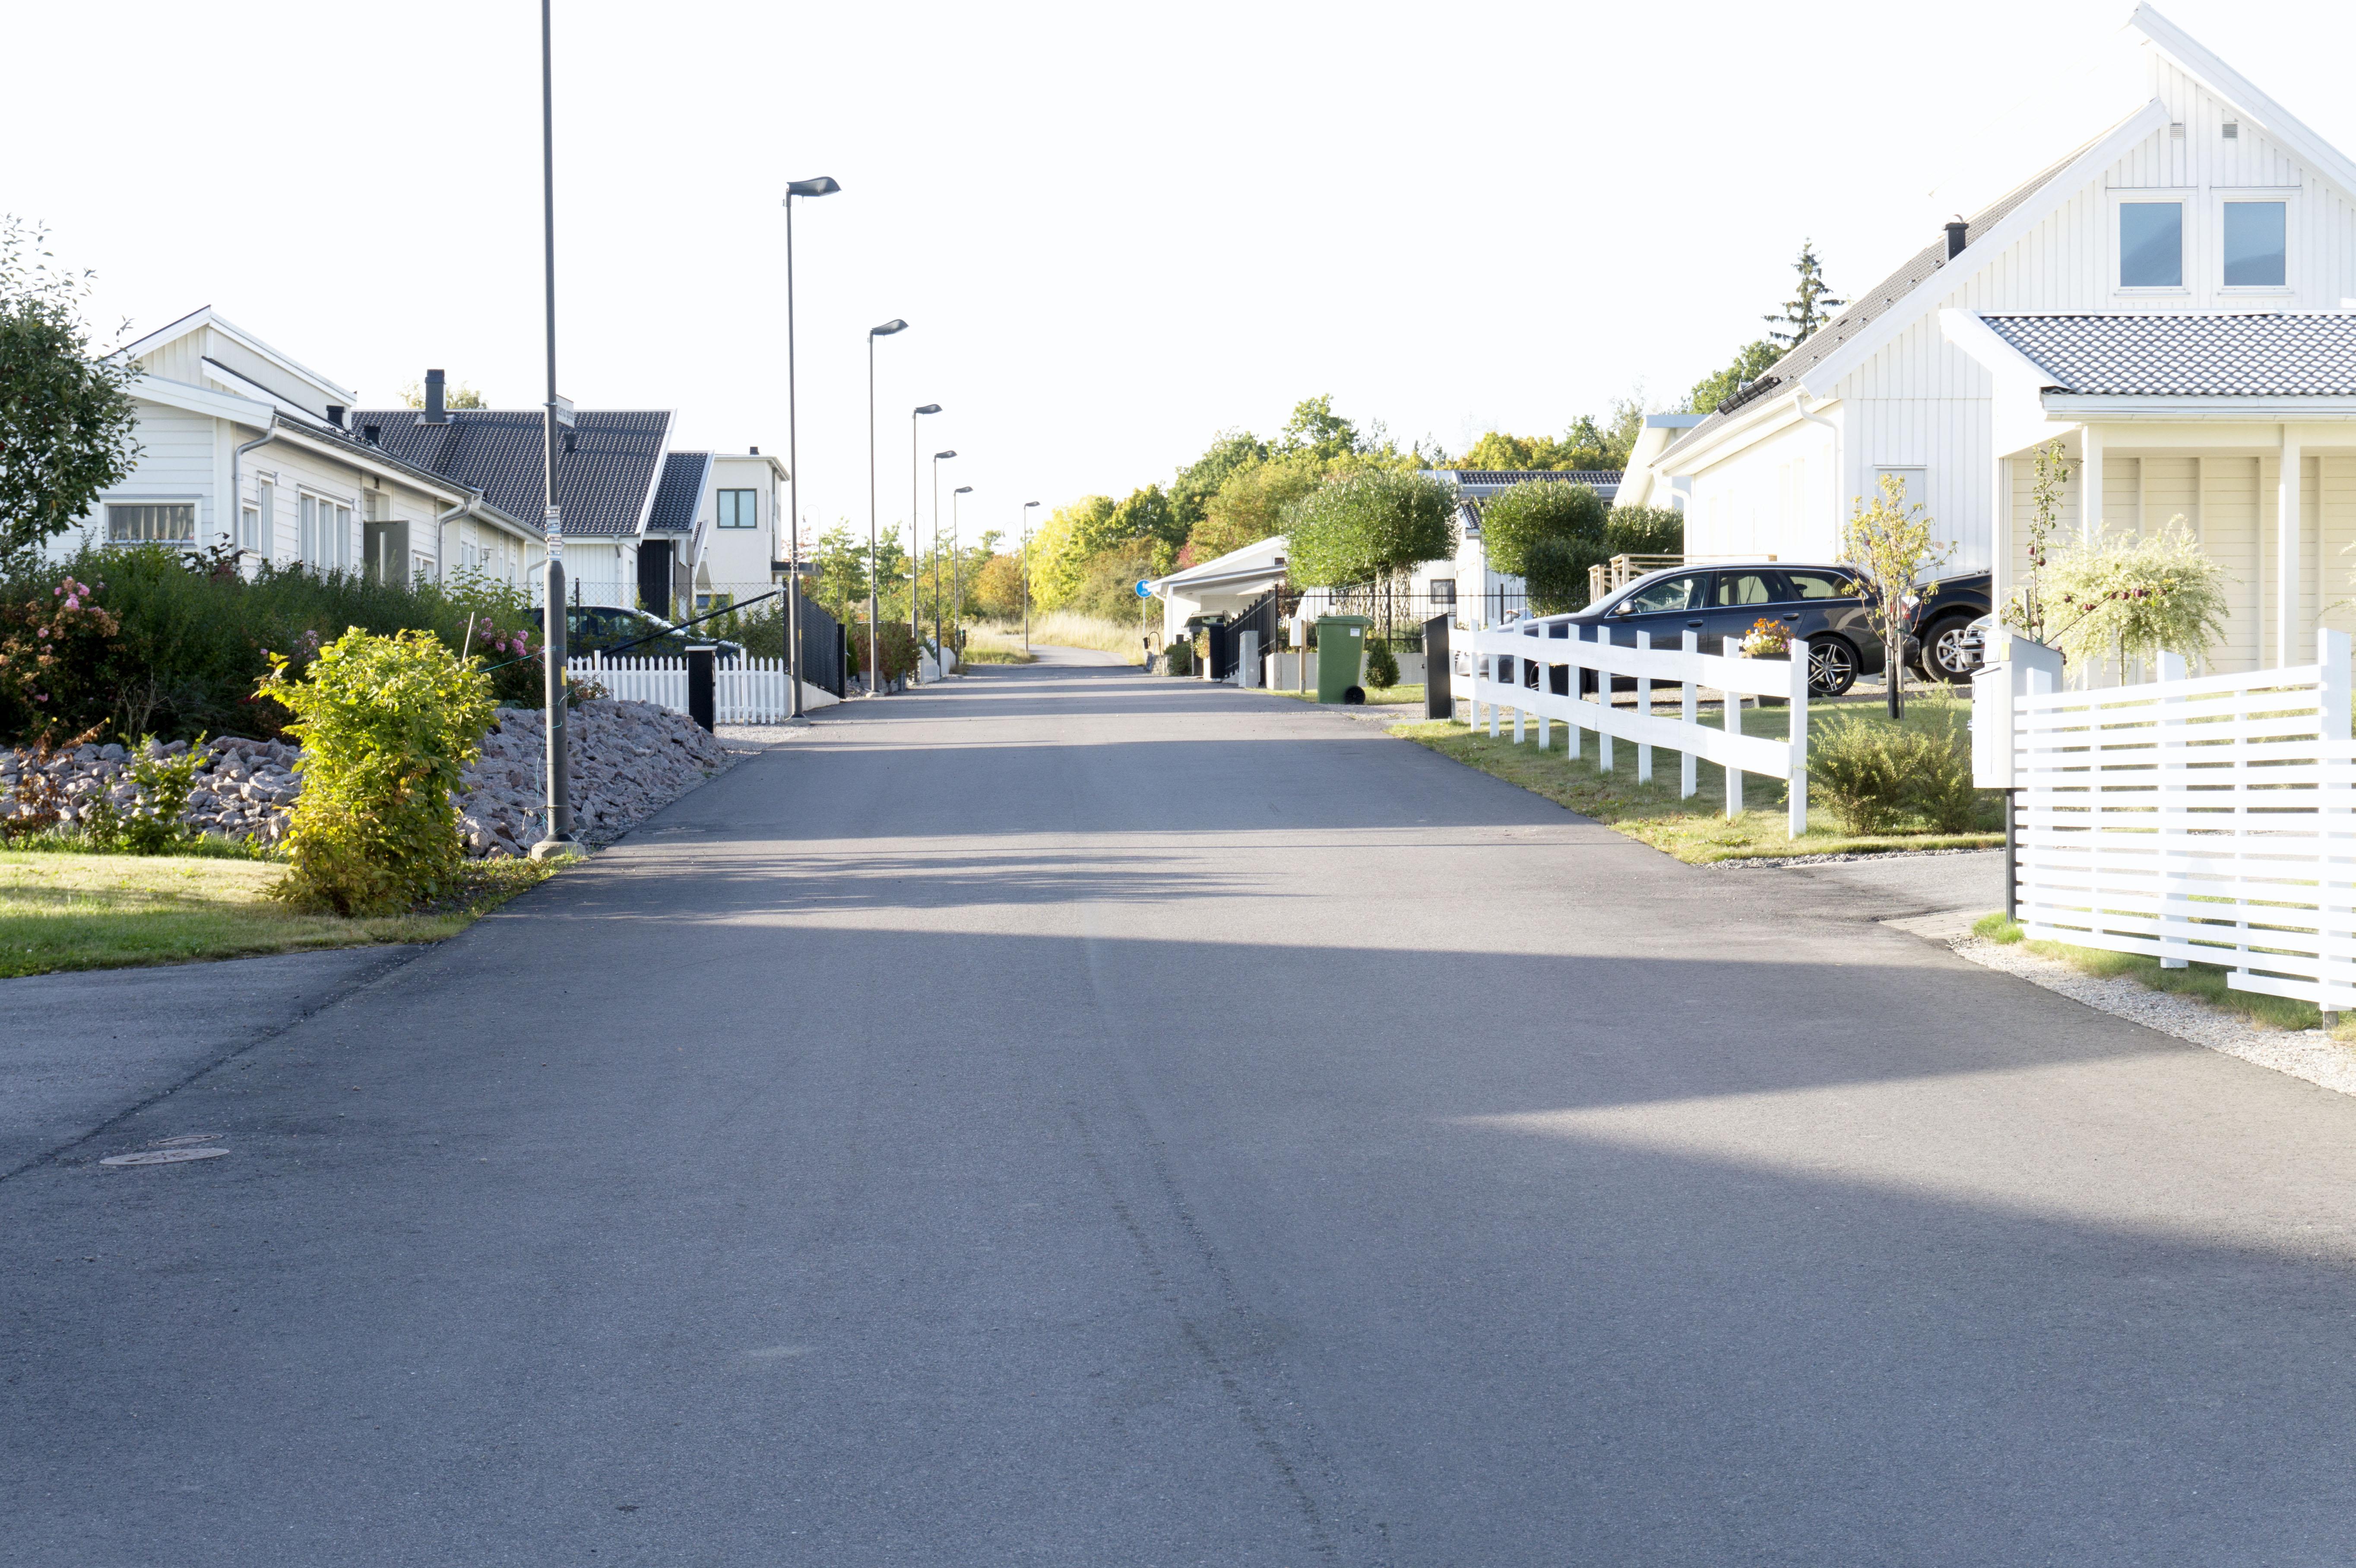 street3a